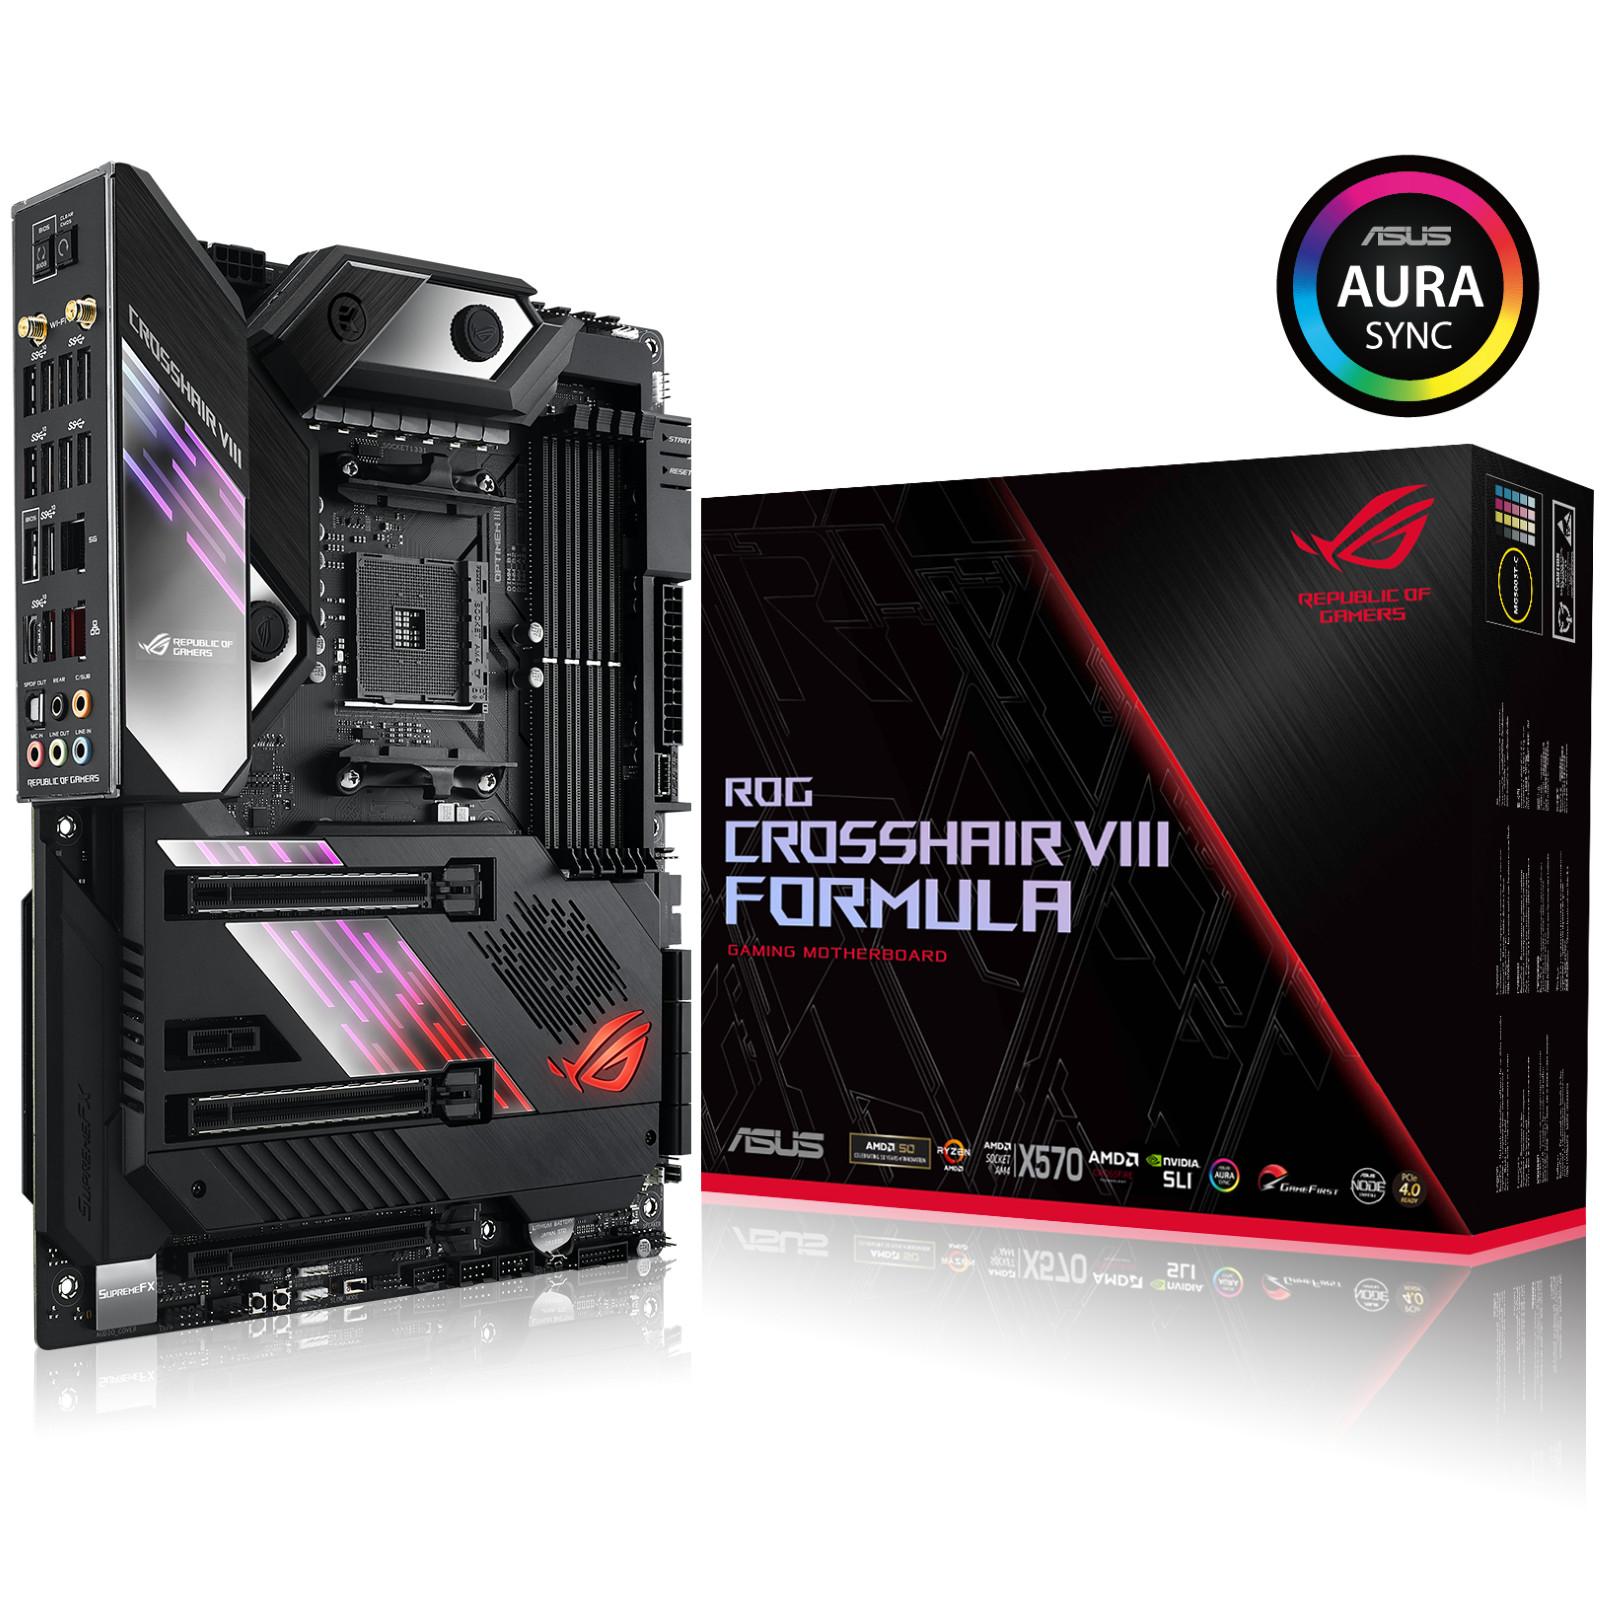 Buy the ASUS ROG CROSSHAIR VIII FORMULA X570 ATX For AMD